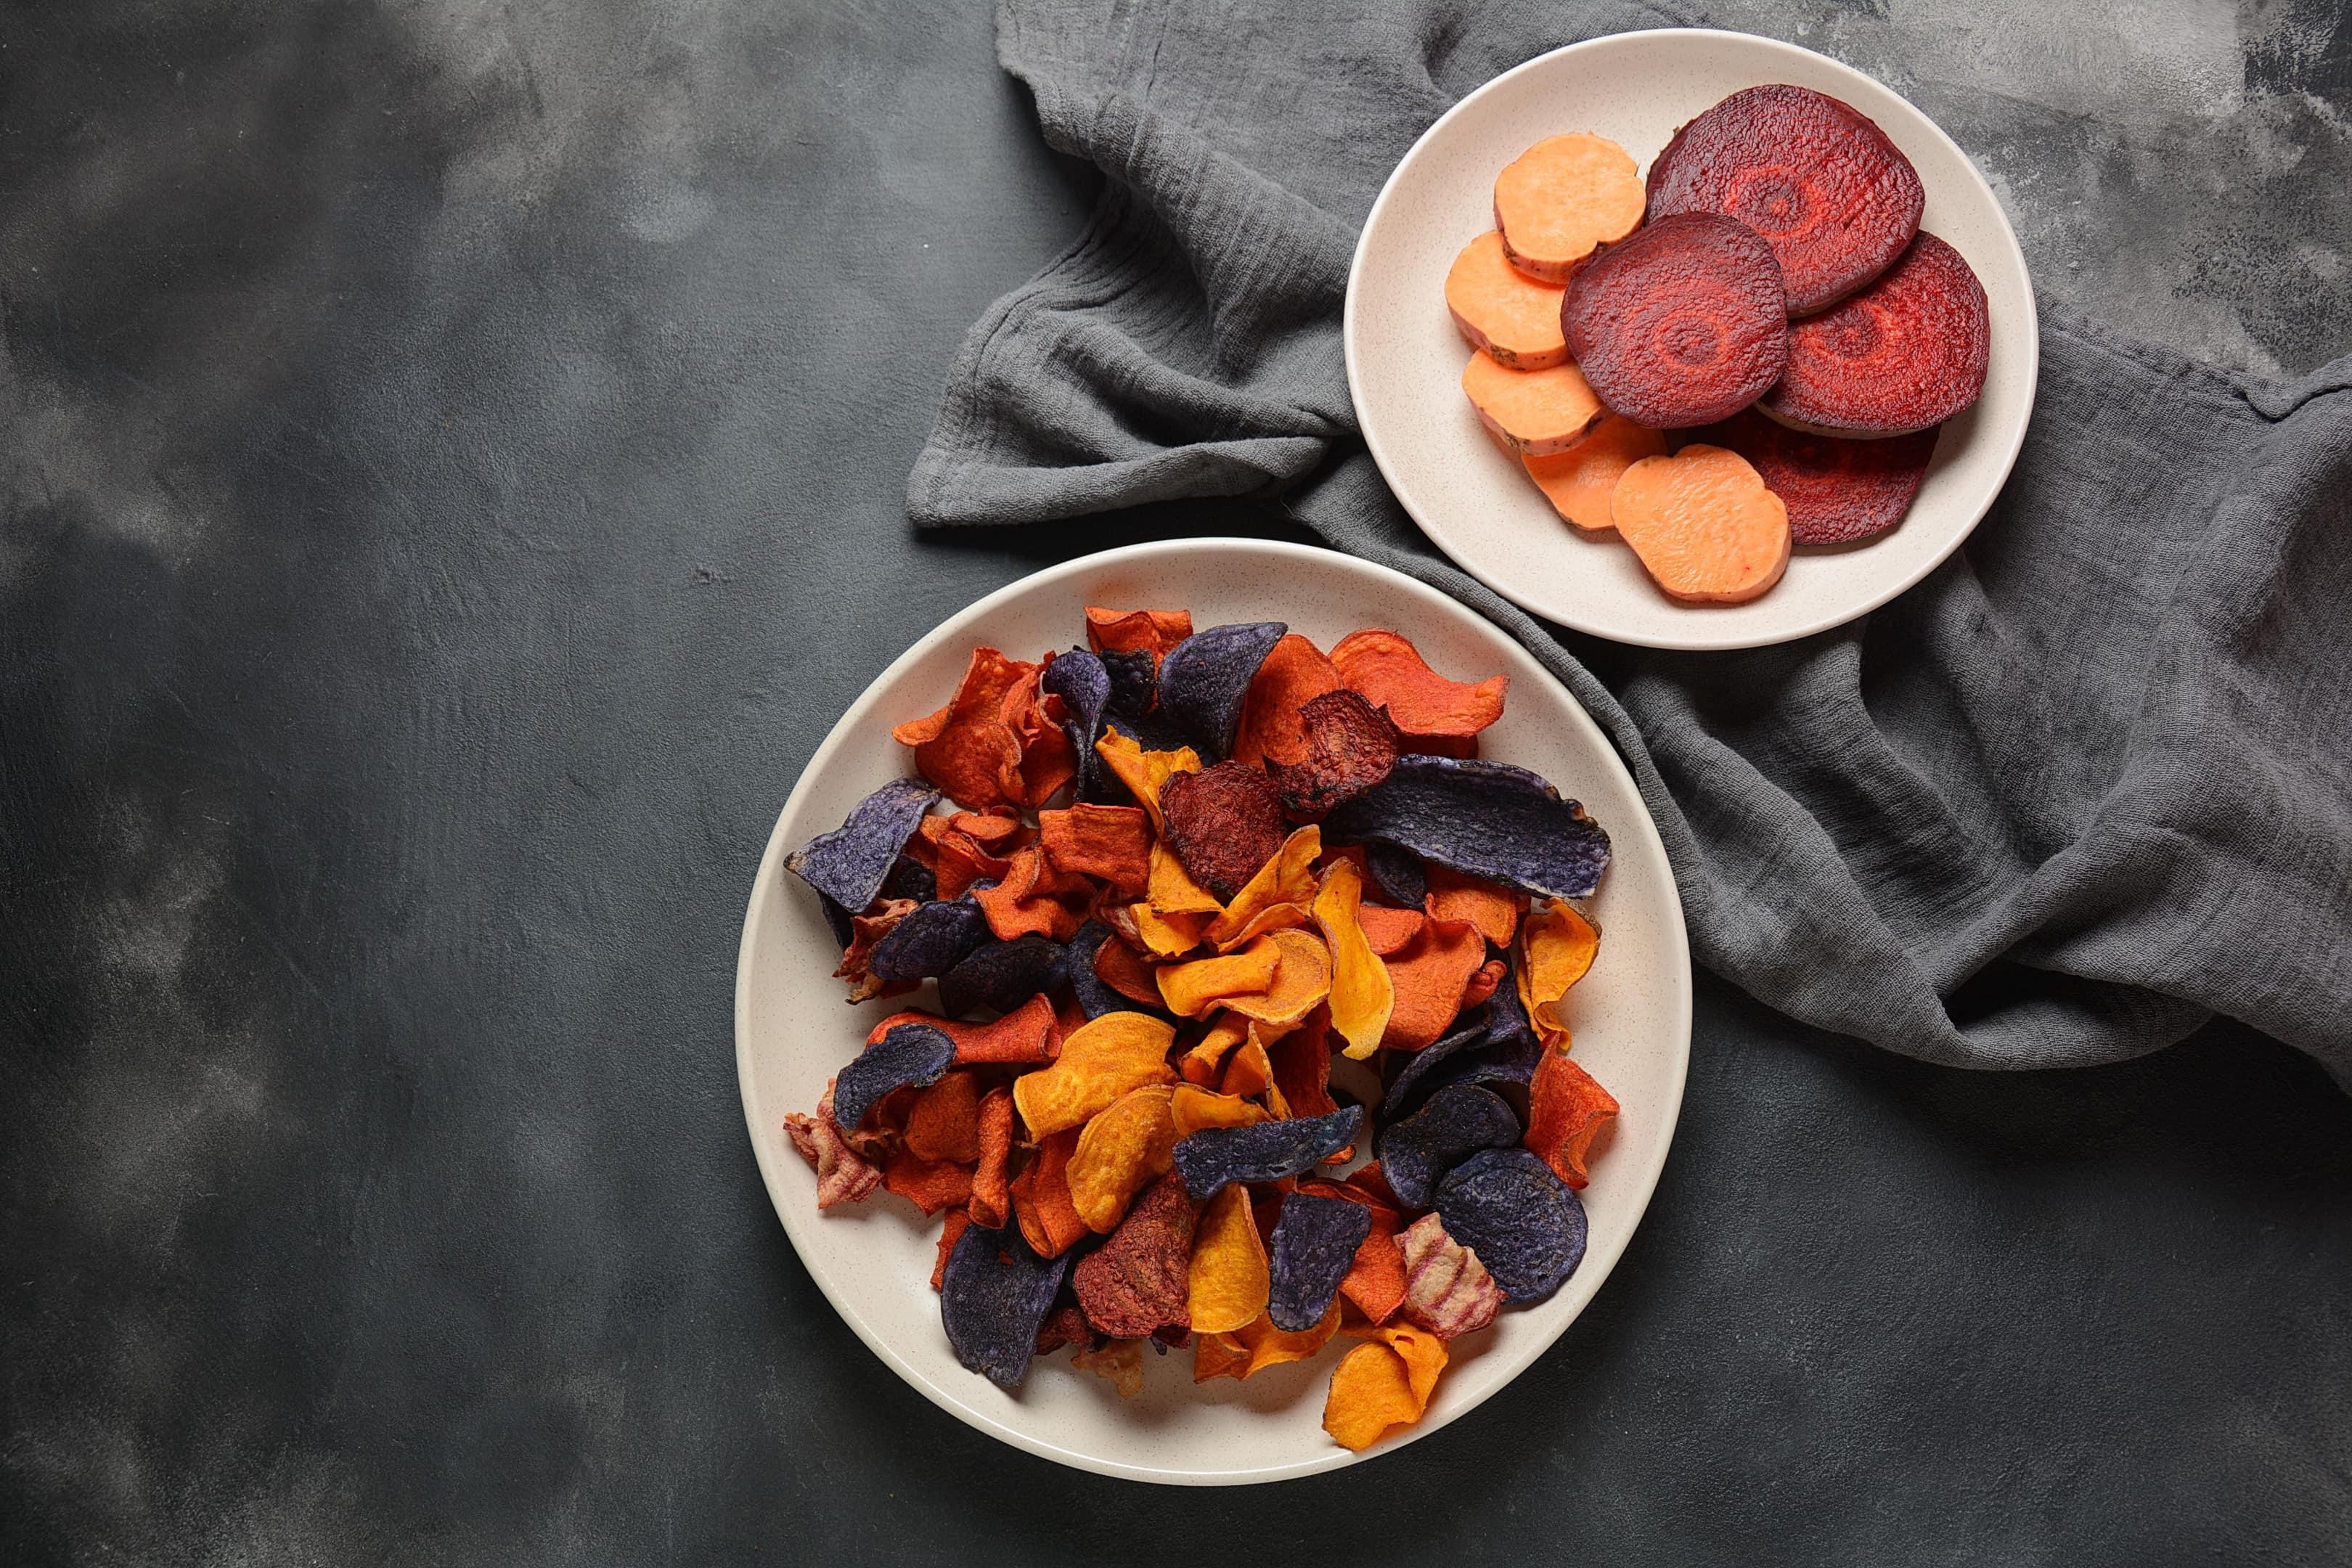 Salt-free baked root vegetable chips — sweet potato, purple sweet potato, carrot and beetroot